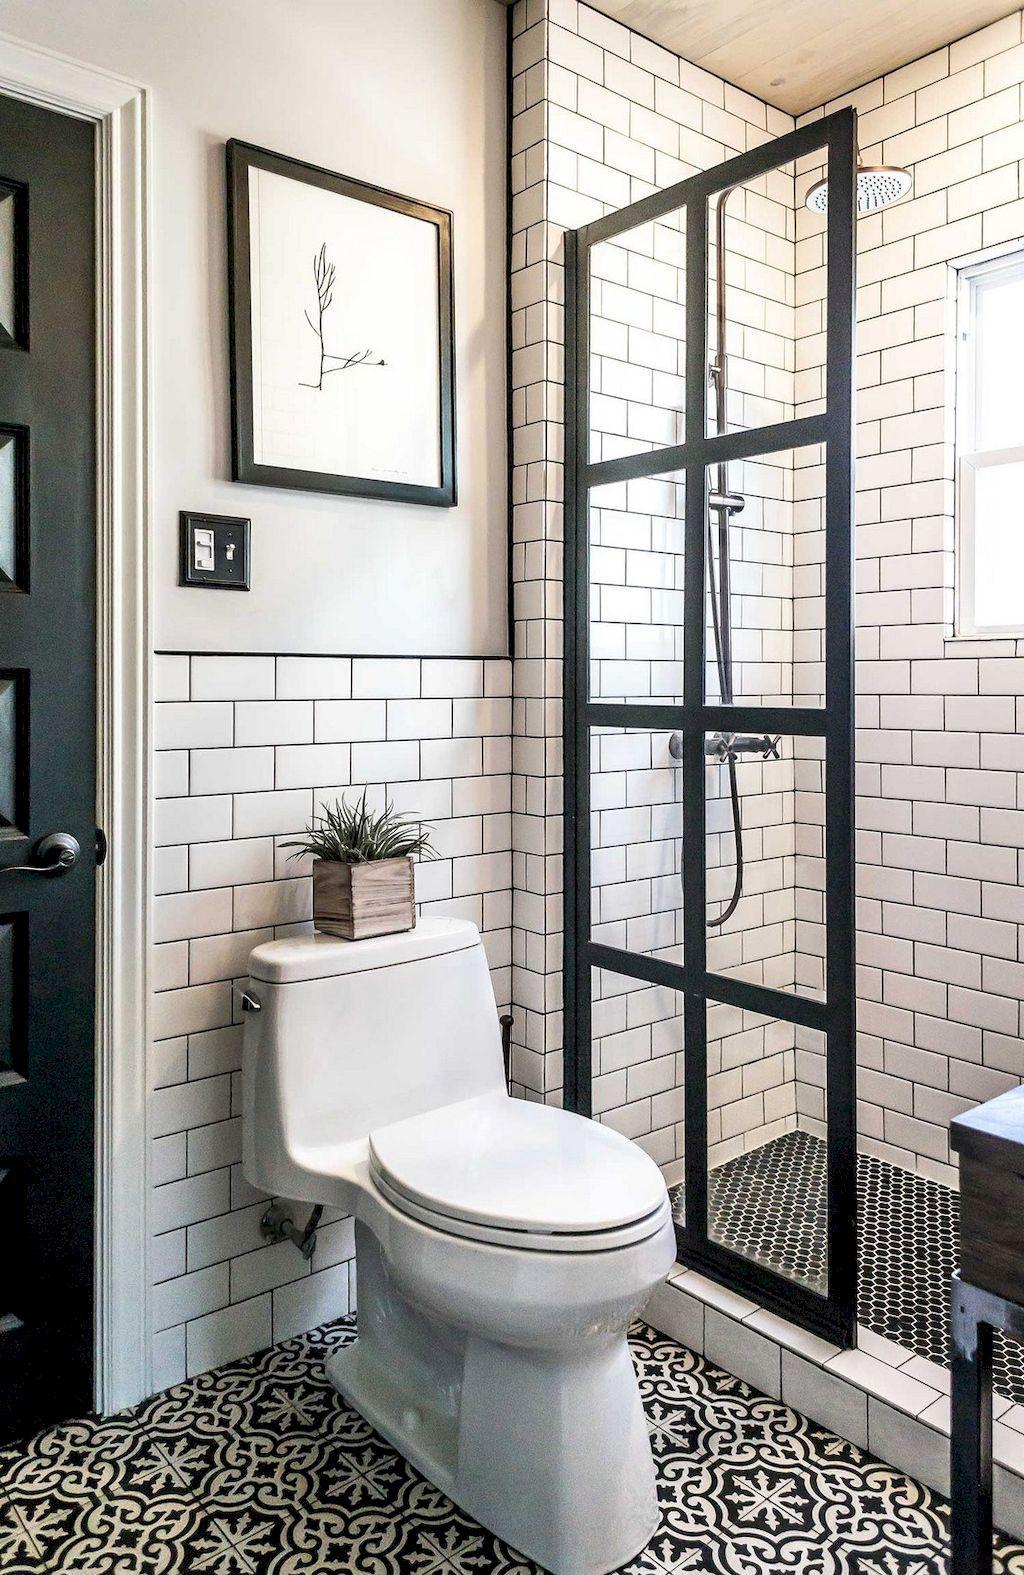 Nice 40 Inspiring Studio Apartment Bathroom Remodel Ideas S Homstuff 2017 08 03